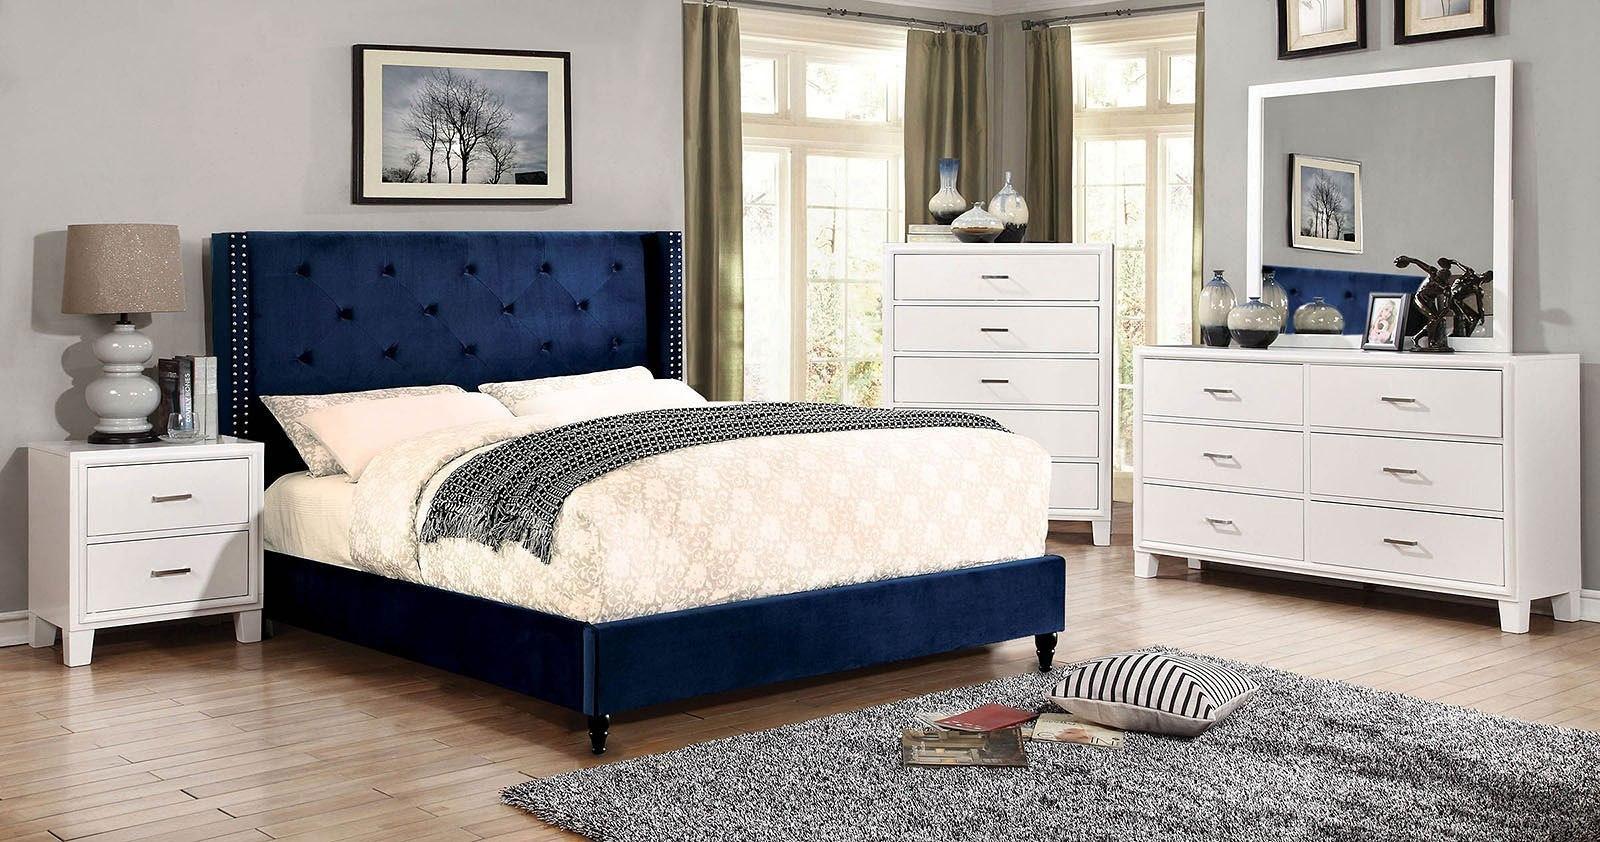 Anabelle Navy Upholstered Bedroom Set By Furniture Of America Furniturepick